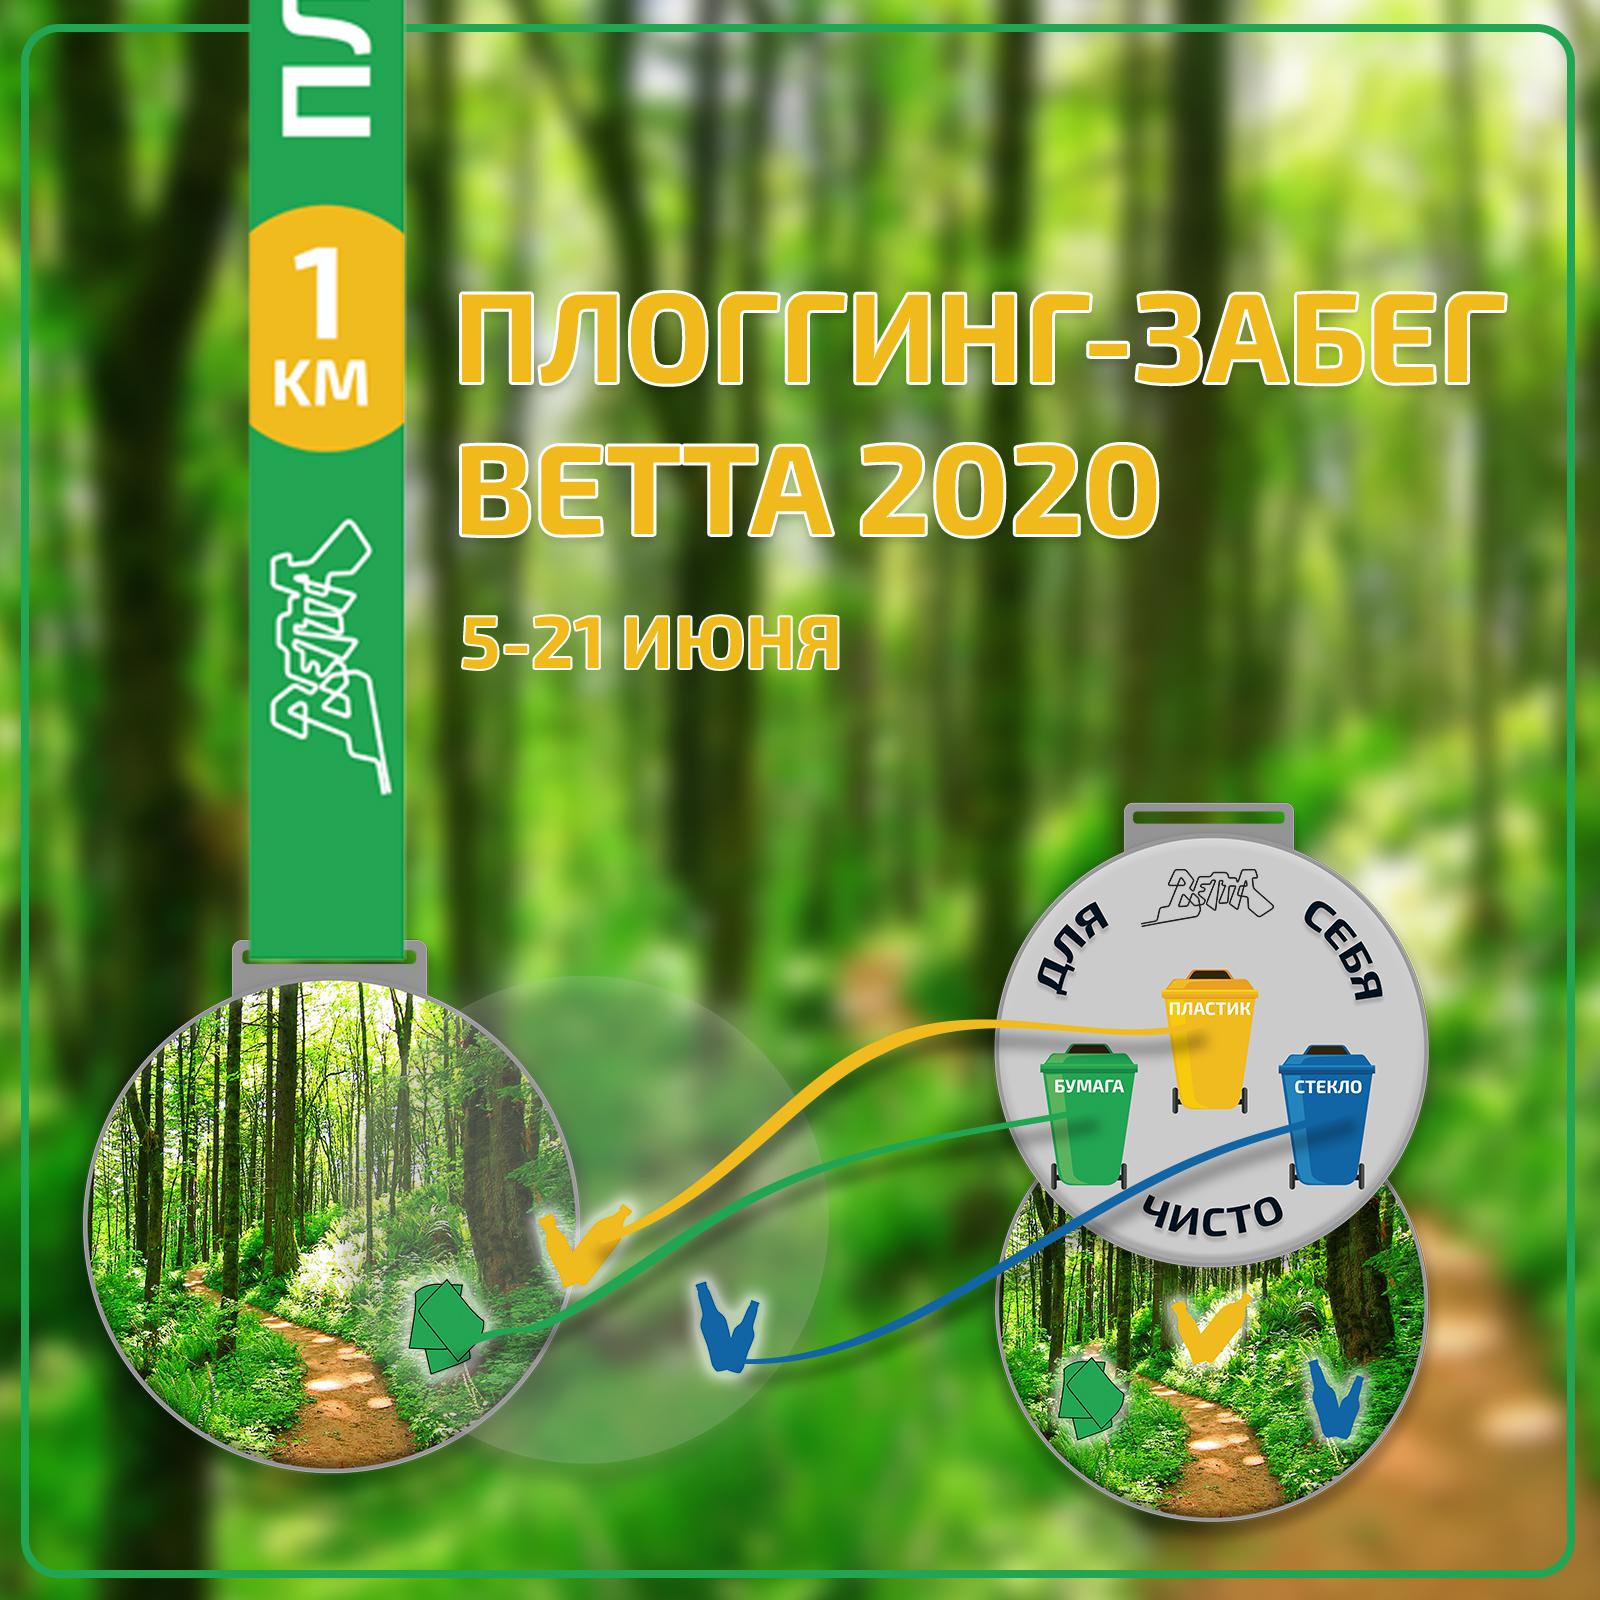 Виртуальный плоггинг-забег BETTA 2020